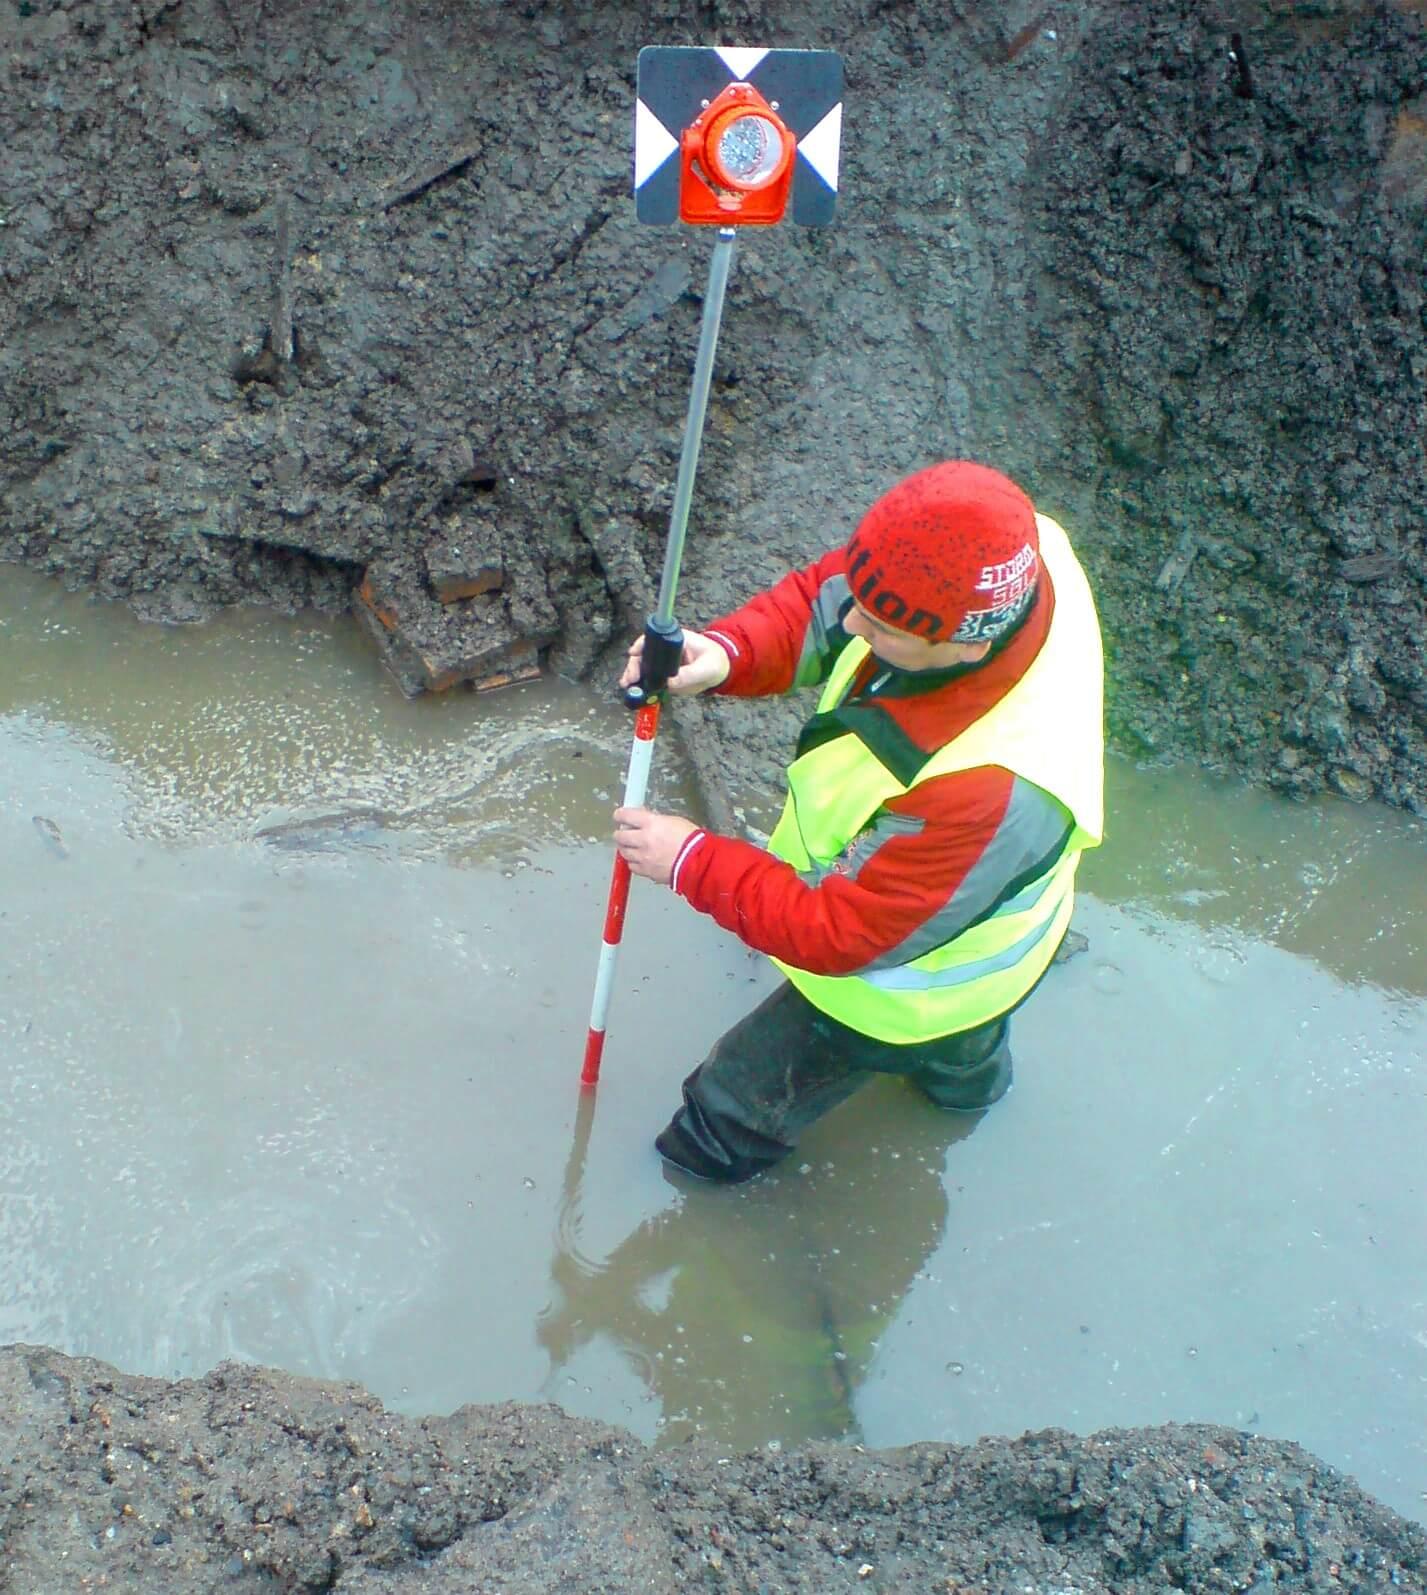 Строительство канализации и топографическая съемка